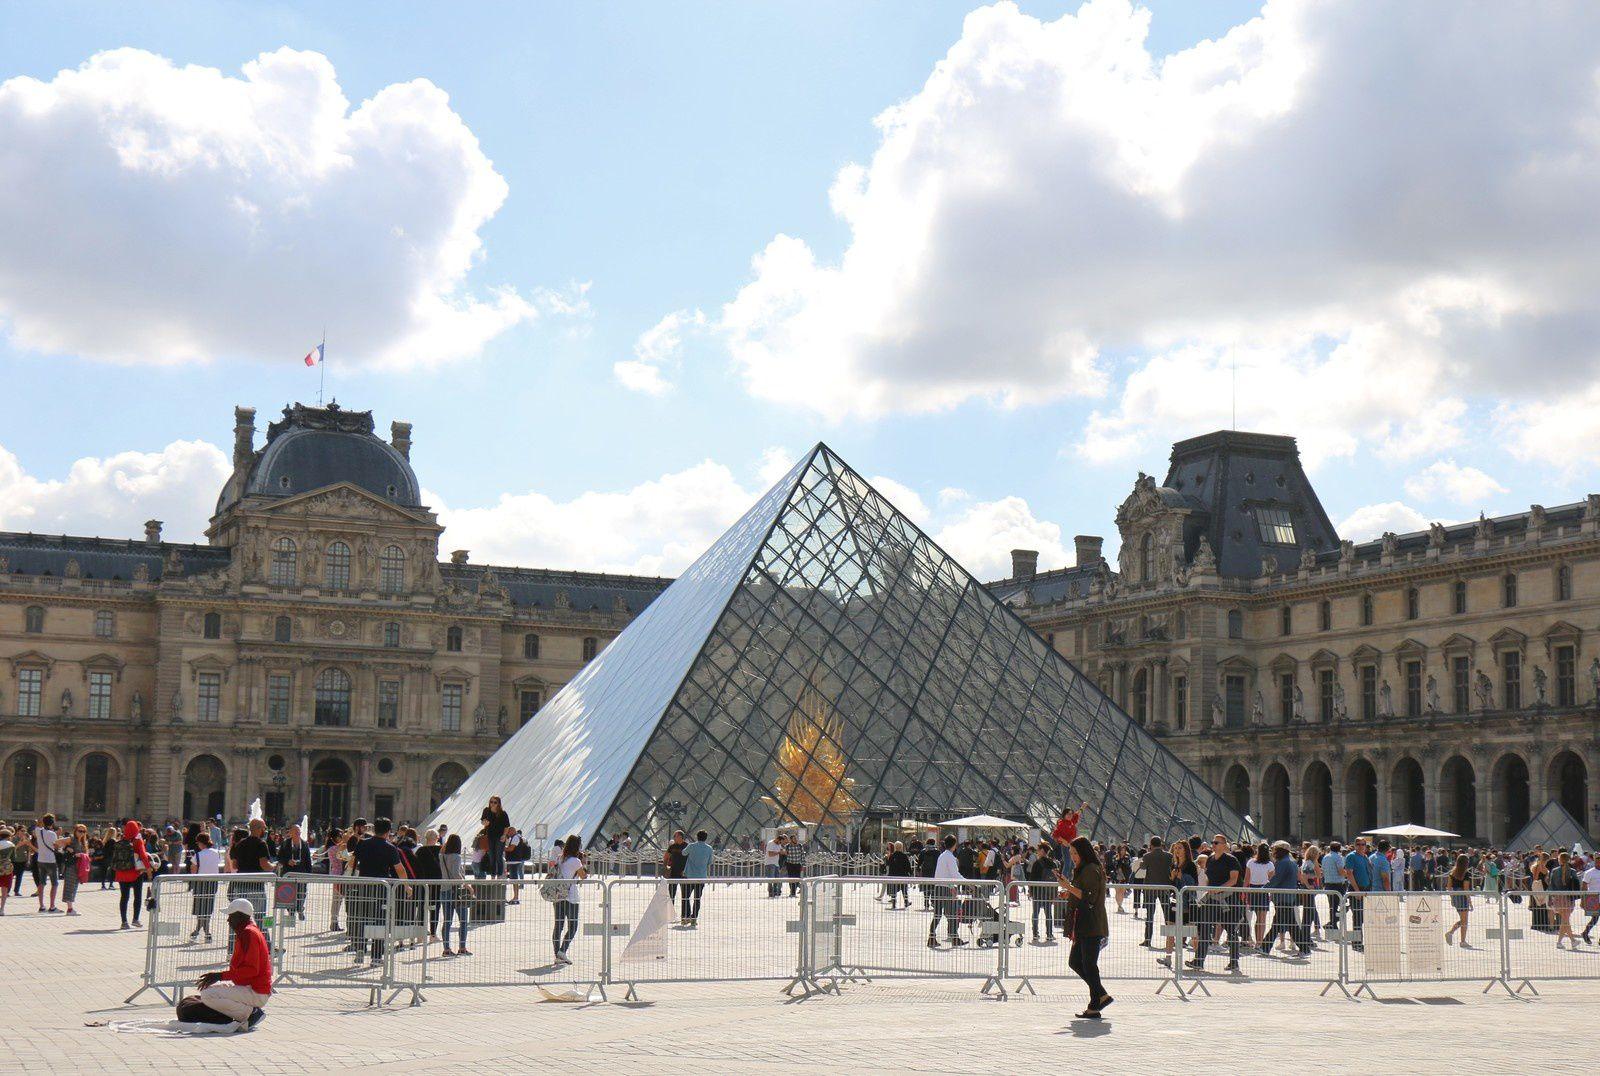 Louis XIV à cheval, Louvre